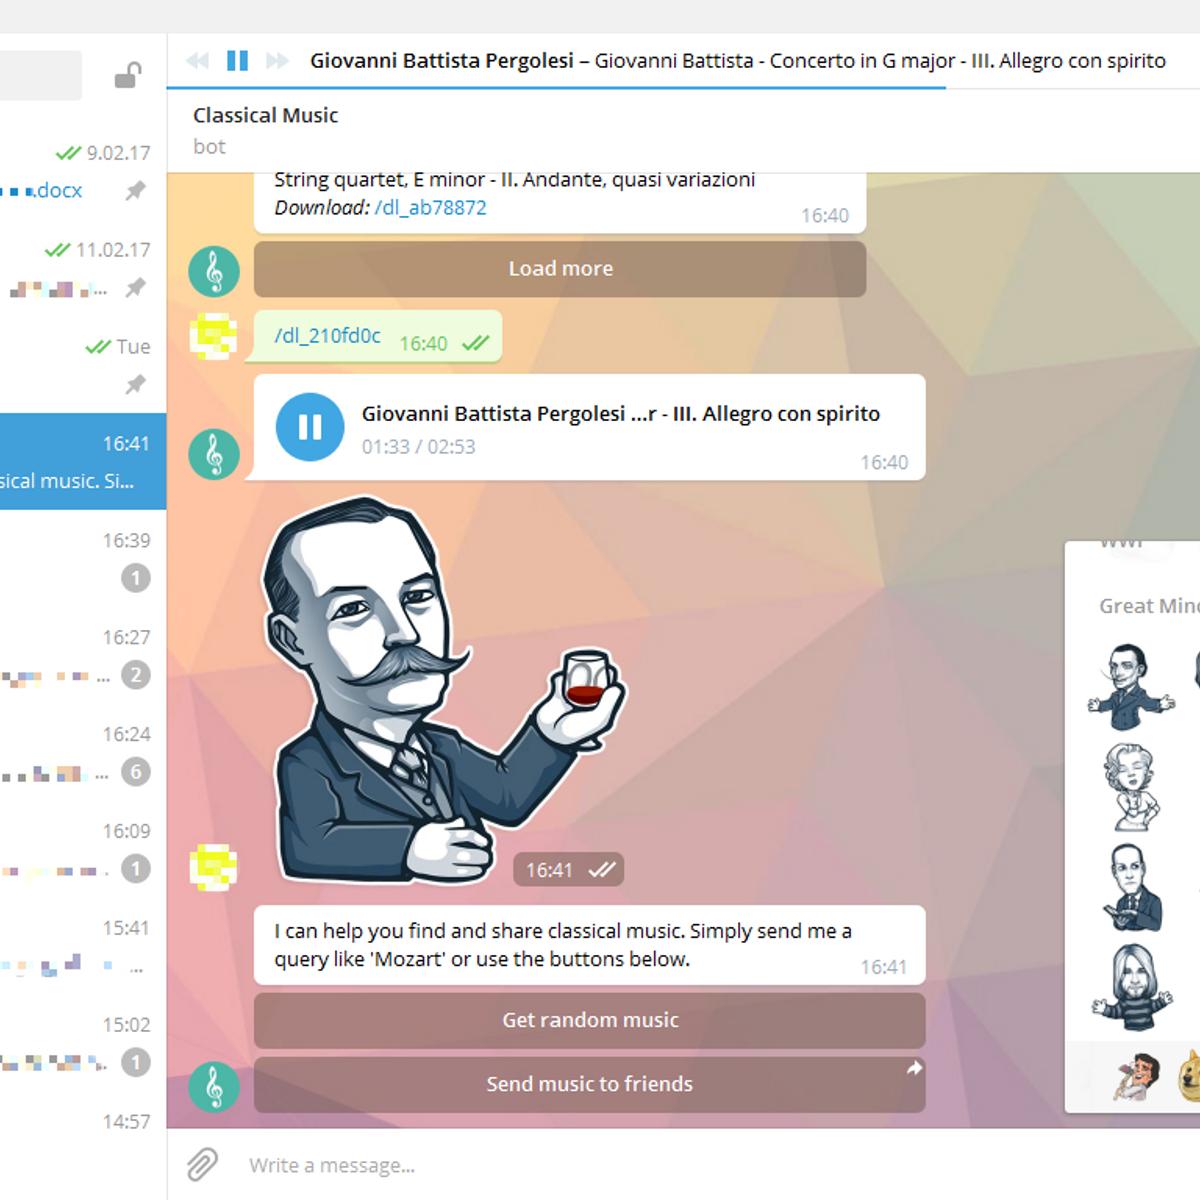 telegram desktop for windows 7 free download